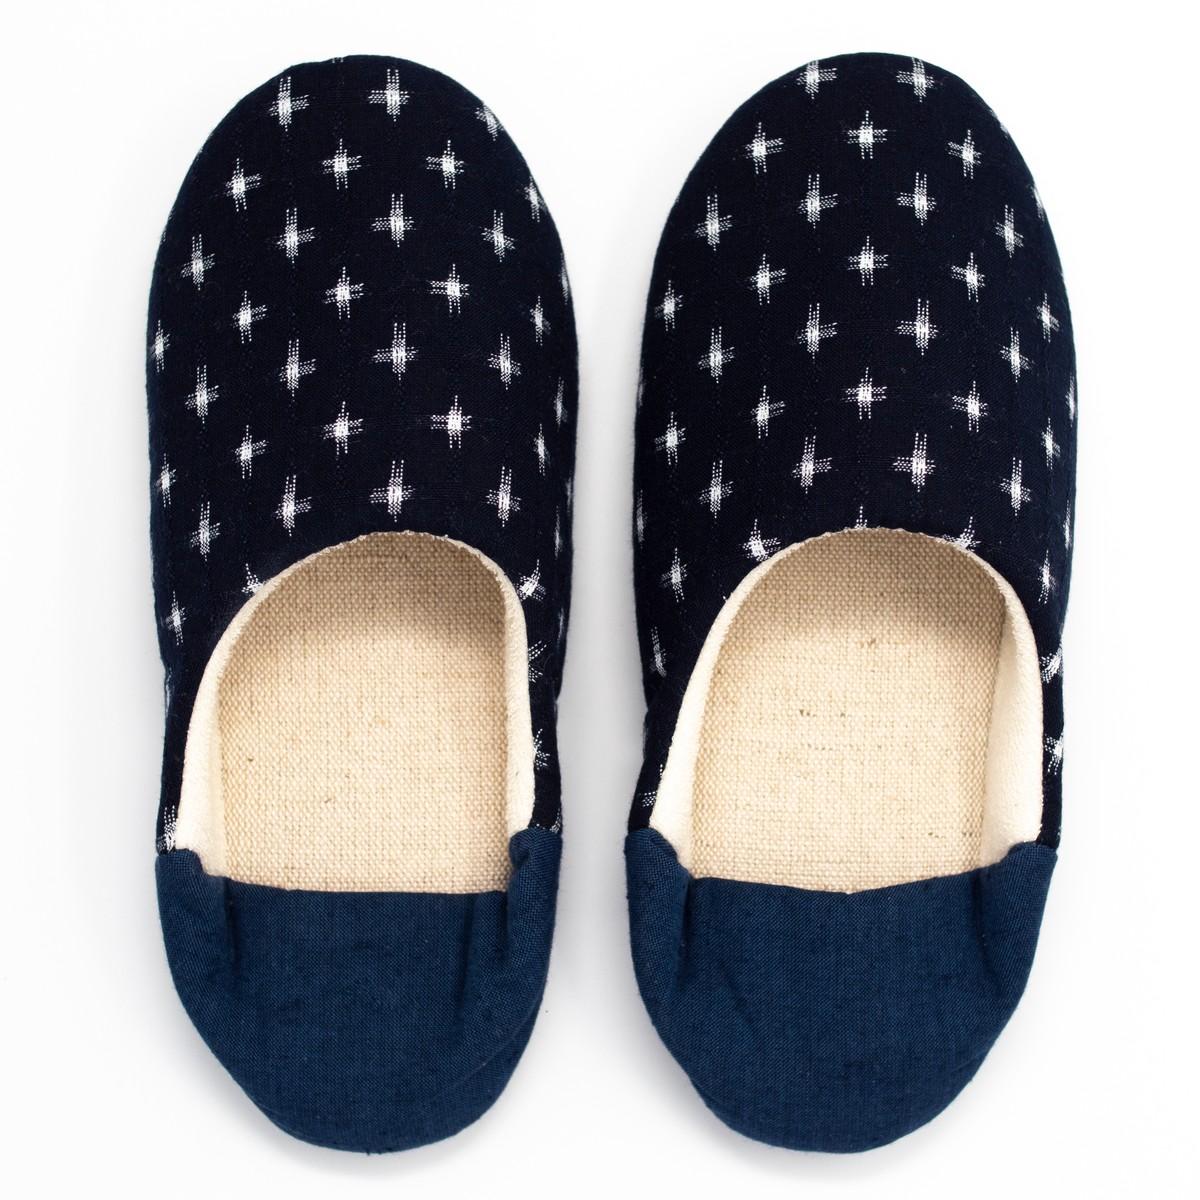 Photo of Indigo Kasuri Babouche Slippers